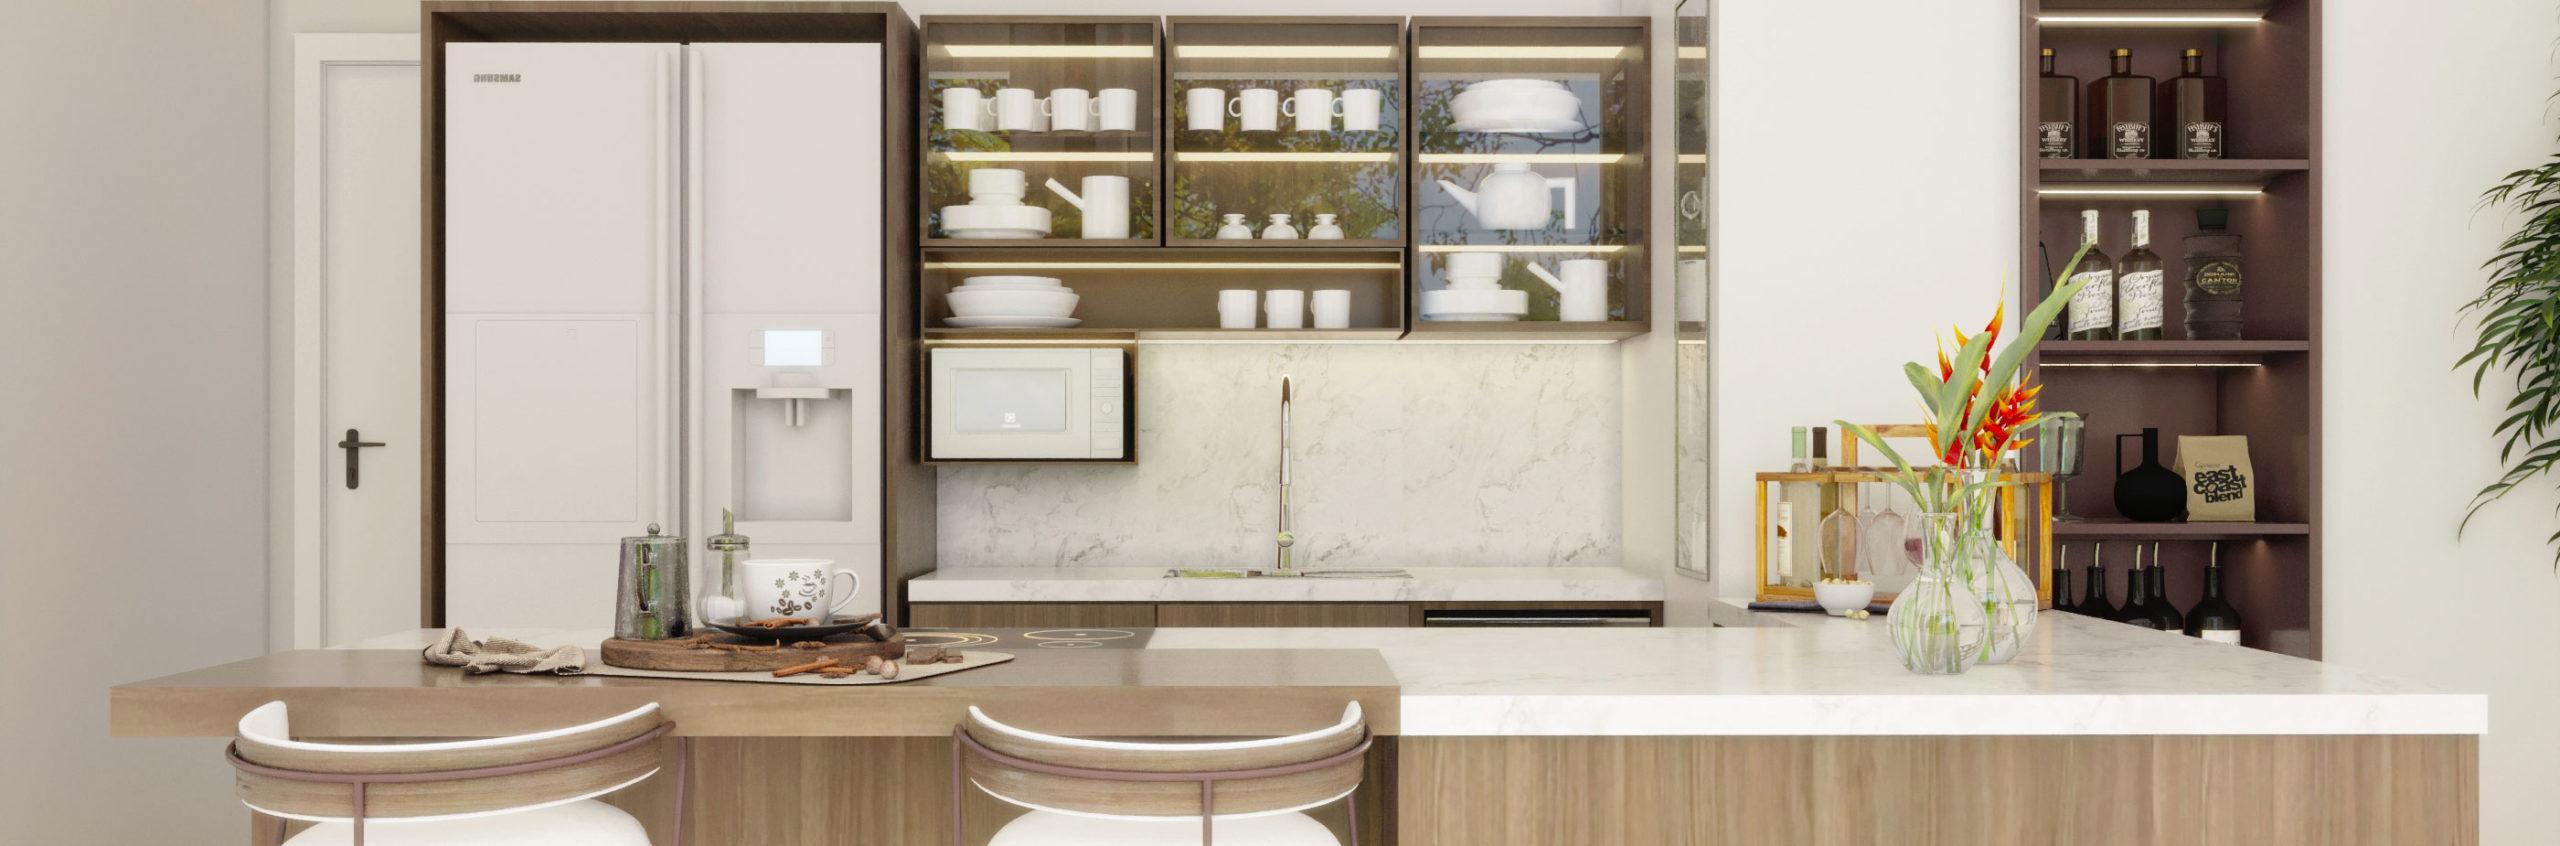 Kitchen Renovations Currumbin